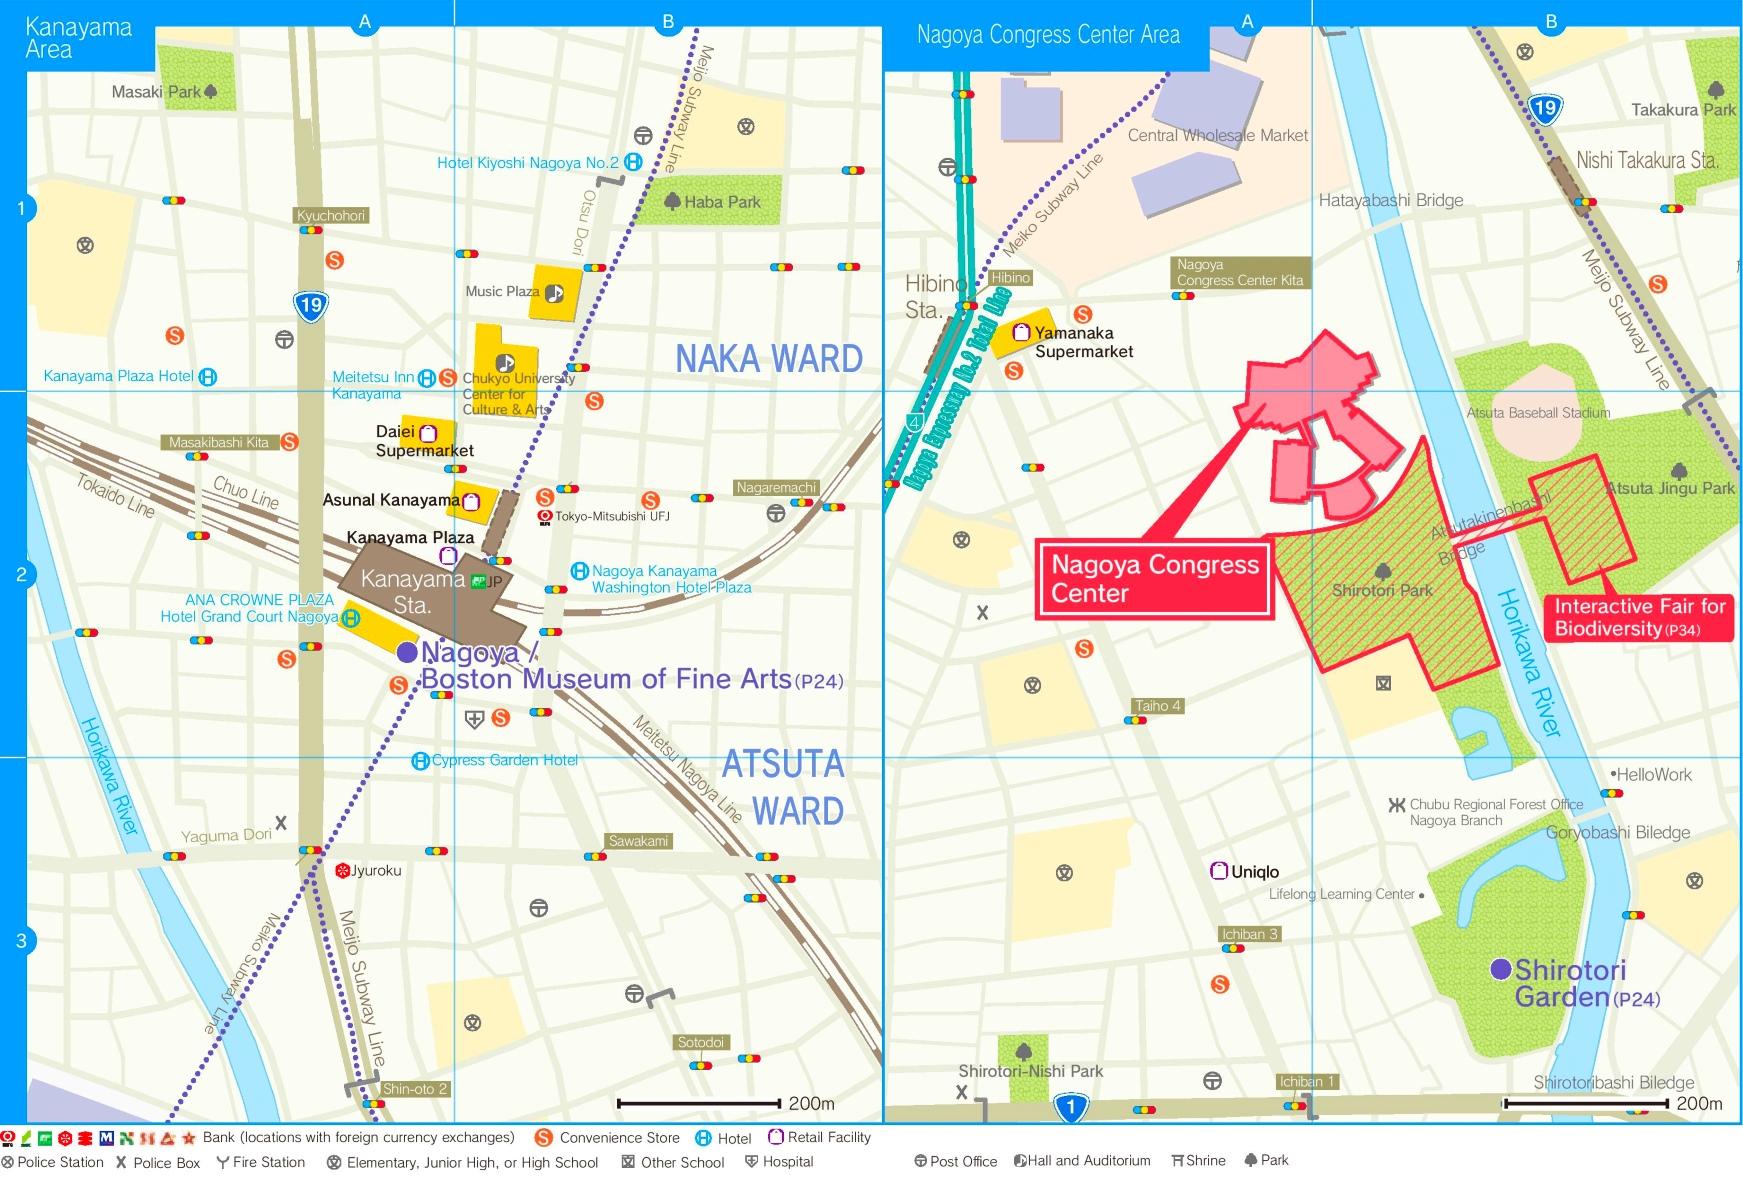 Kenayama Station Area and Nagoya Congress Center Area Map